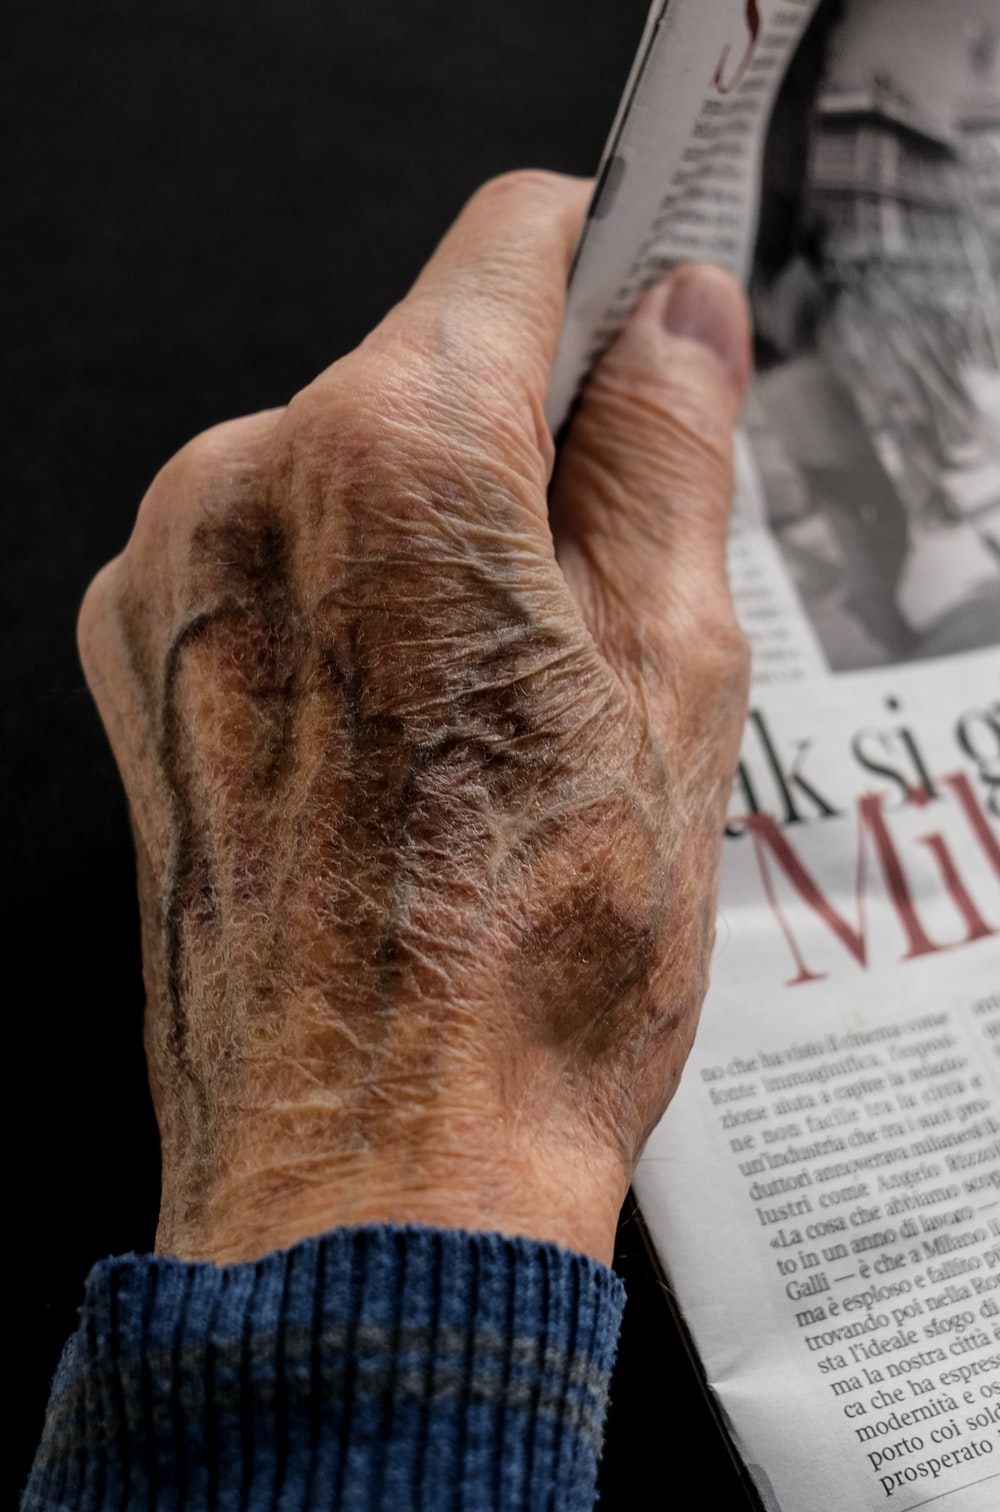 man wearing blue long sleeve top holding newspaper